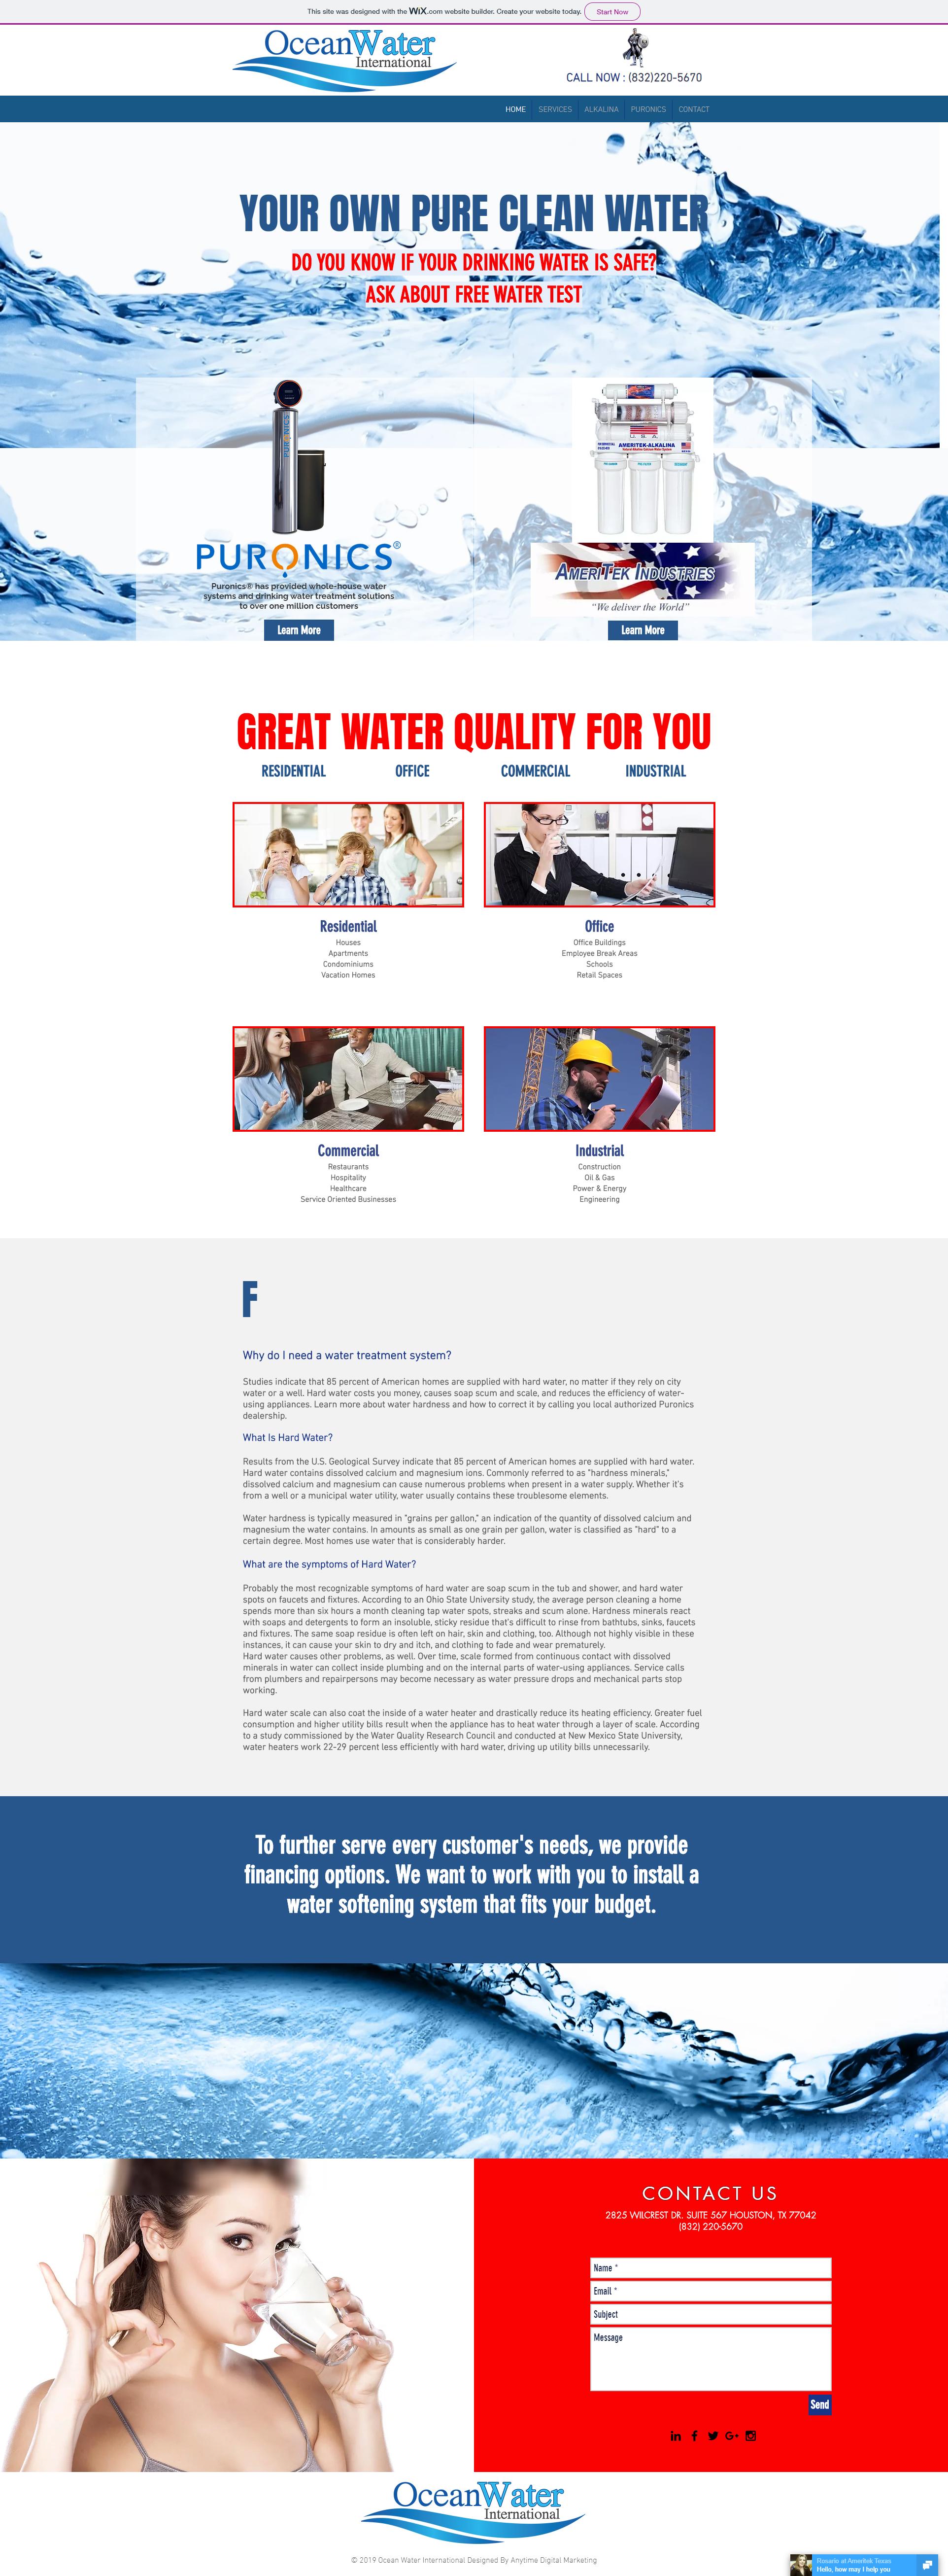 Ocean Water International website design